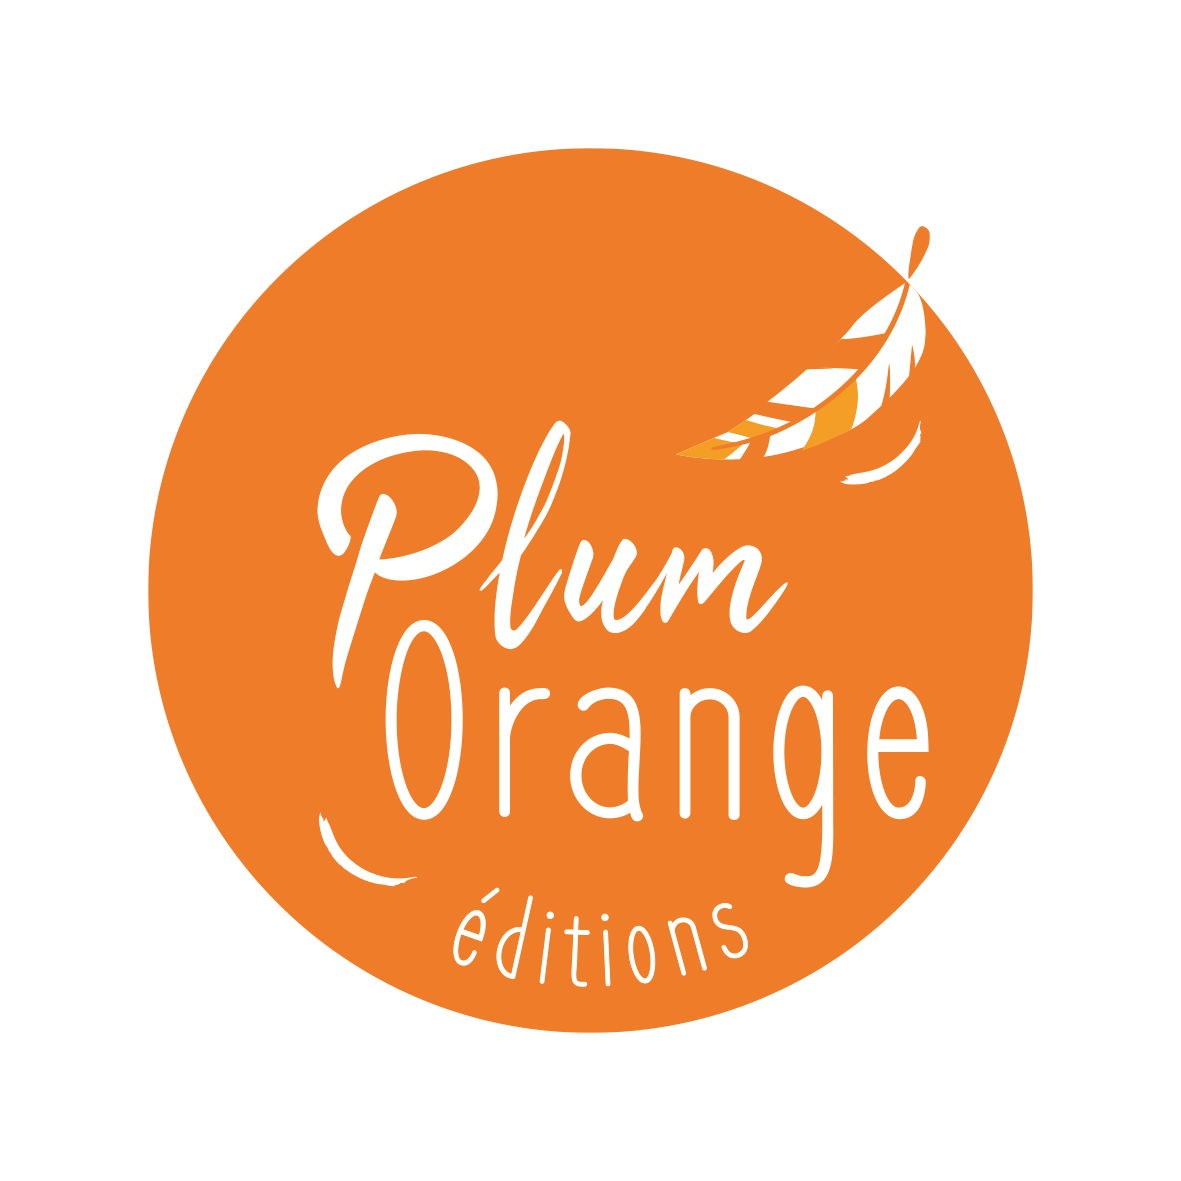 Plum-Orange-proprietaire-cartesdesvinsdefrance